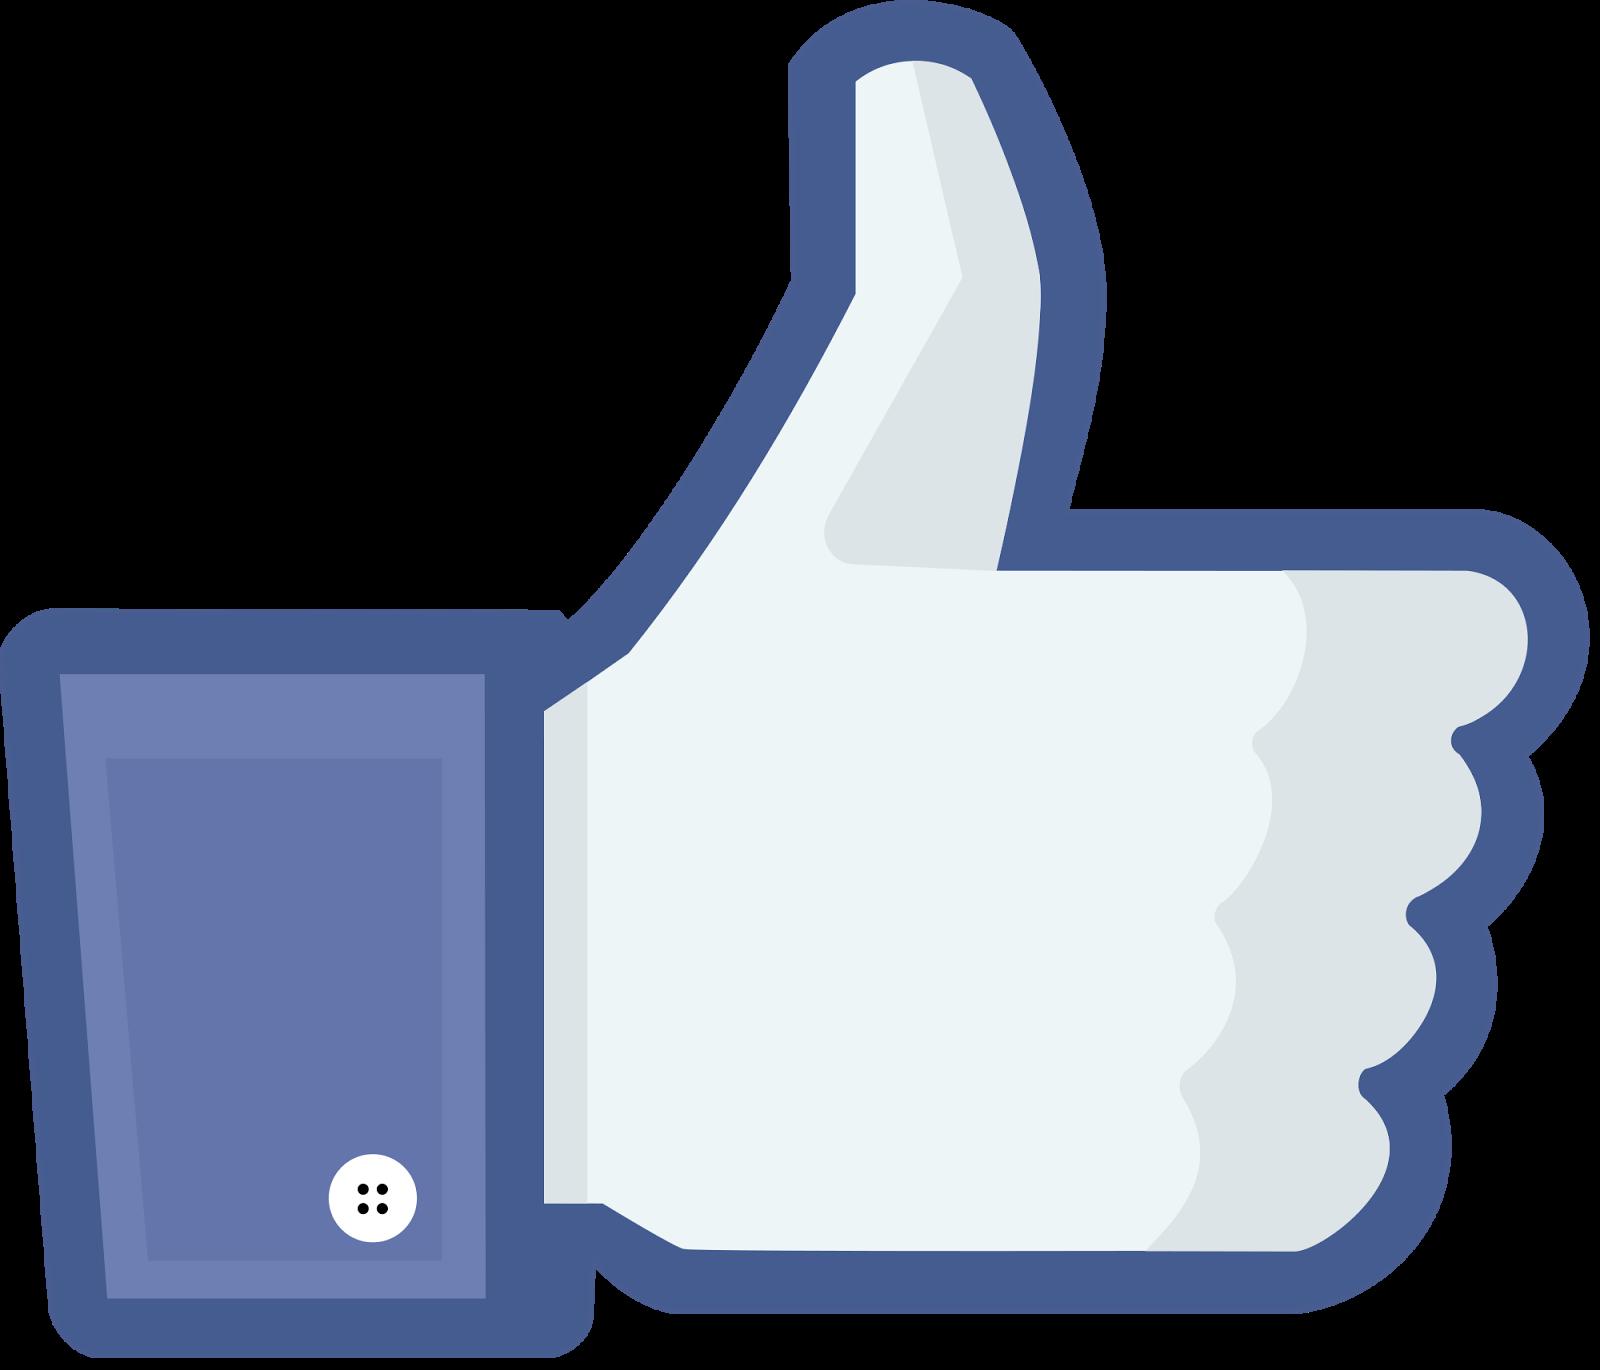 https://www.facebook.com/losmillibros